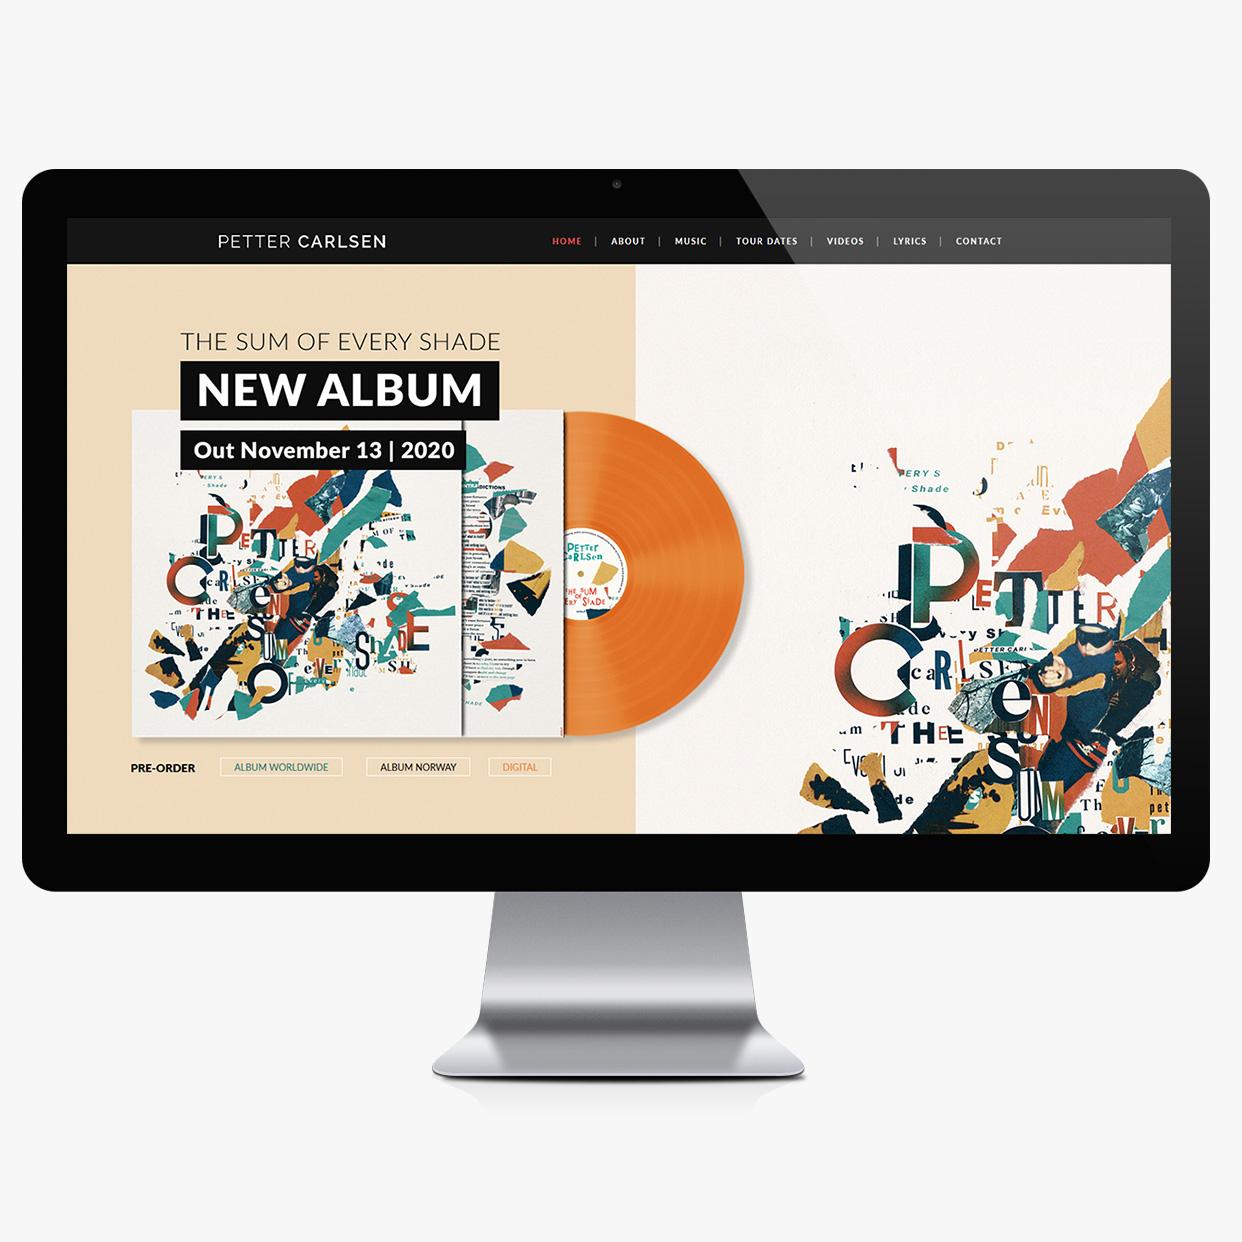 petter-carlsen-new-album-home